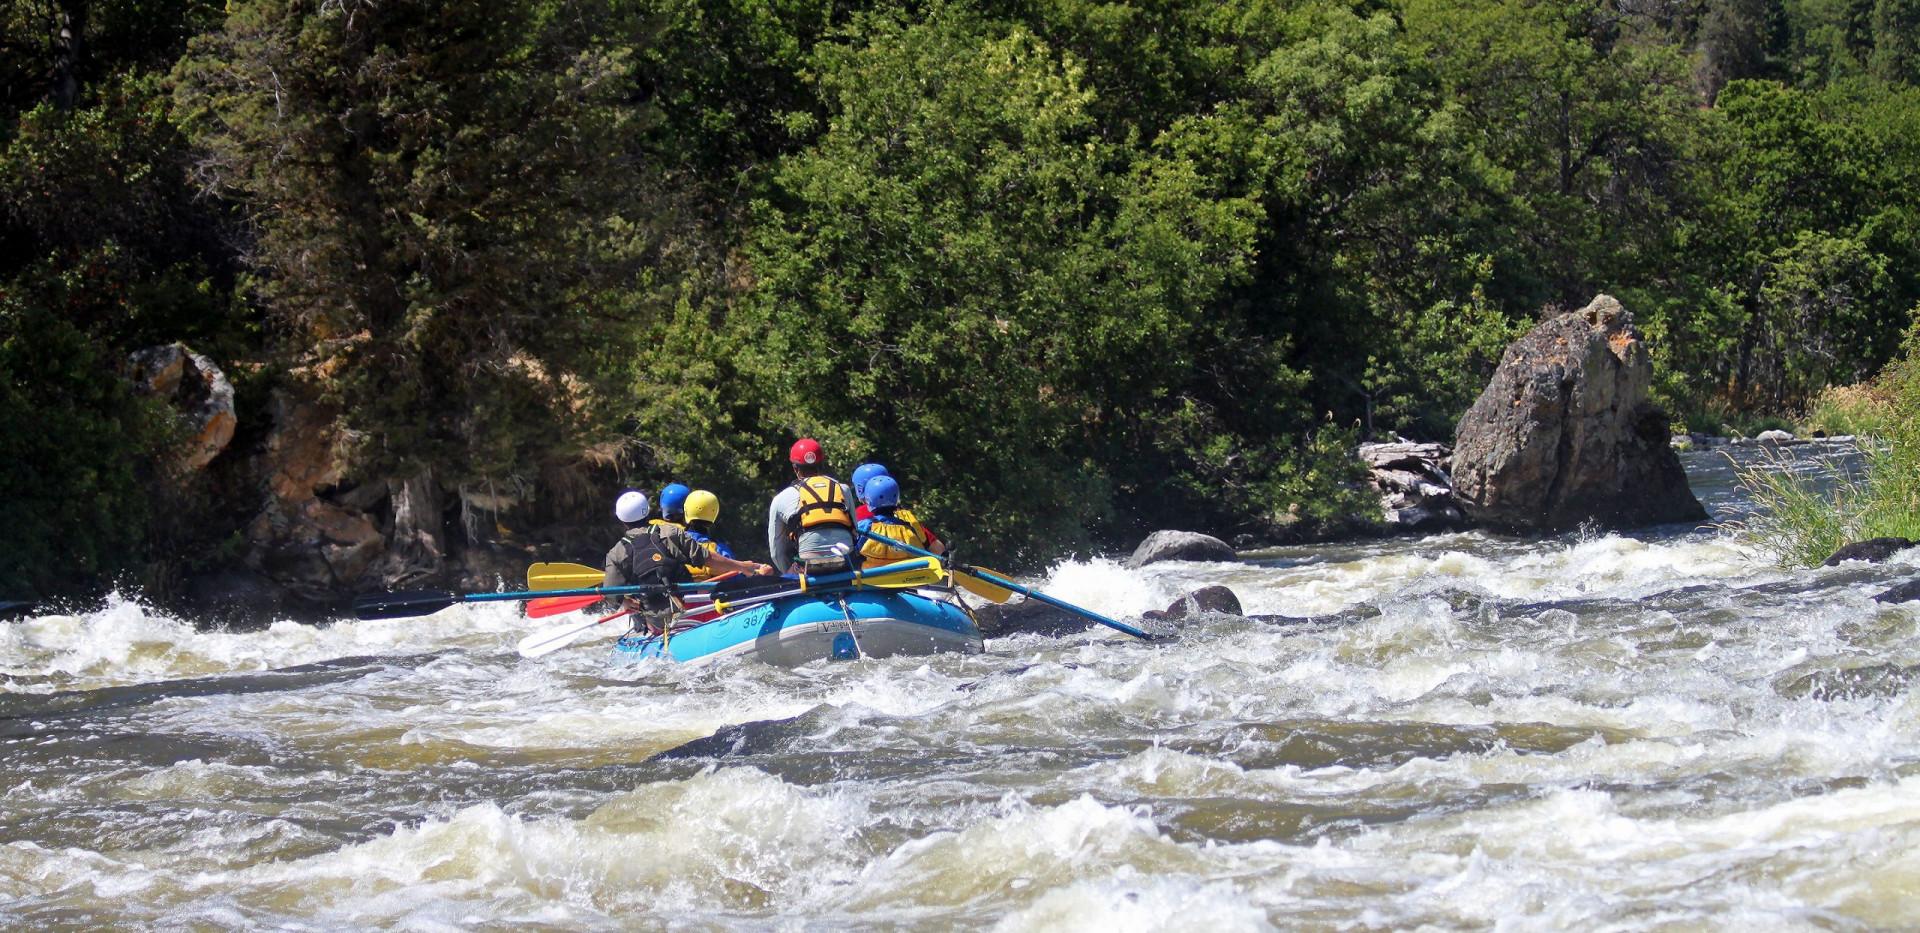 Upper Klamath River - Ambush Rapid - Rafting